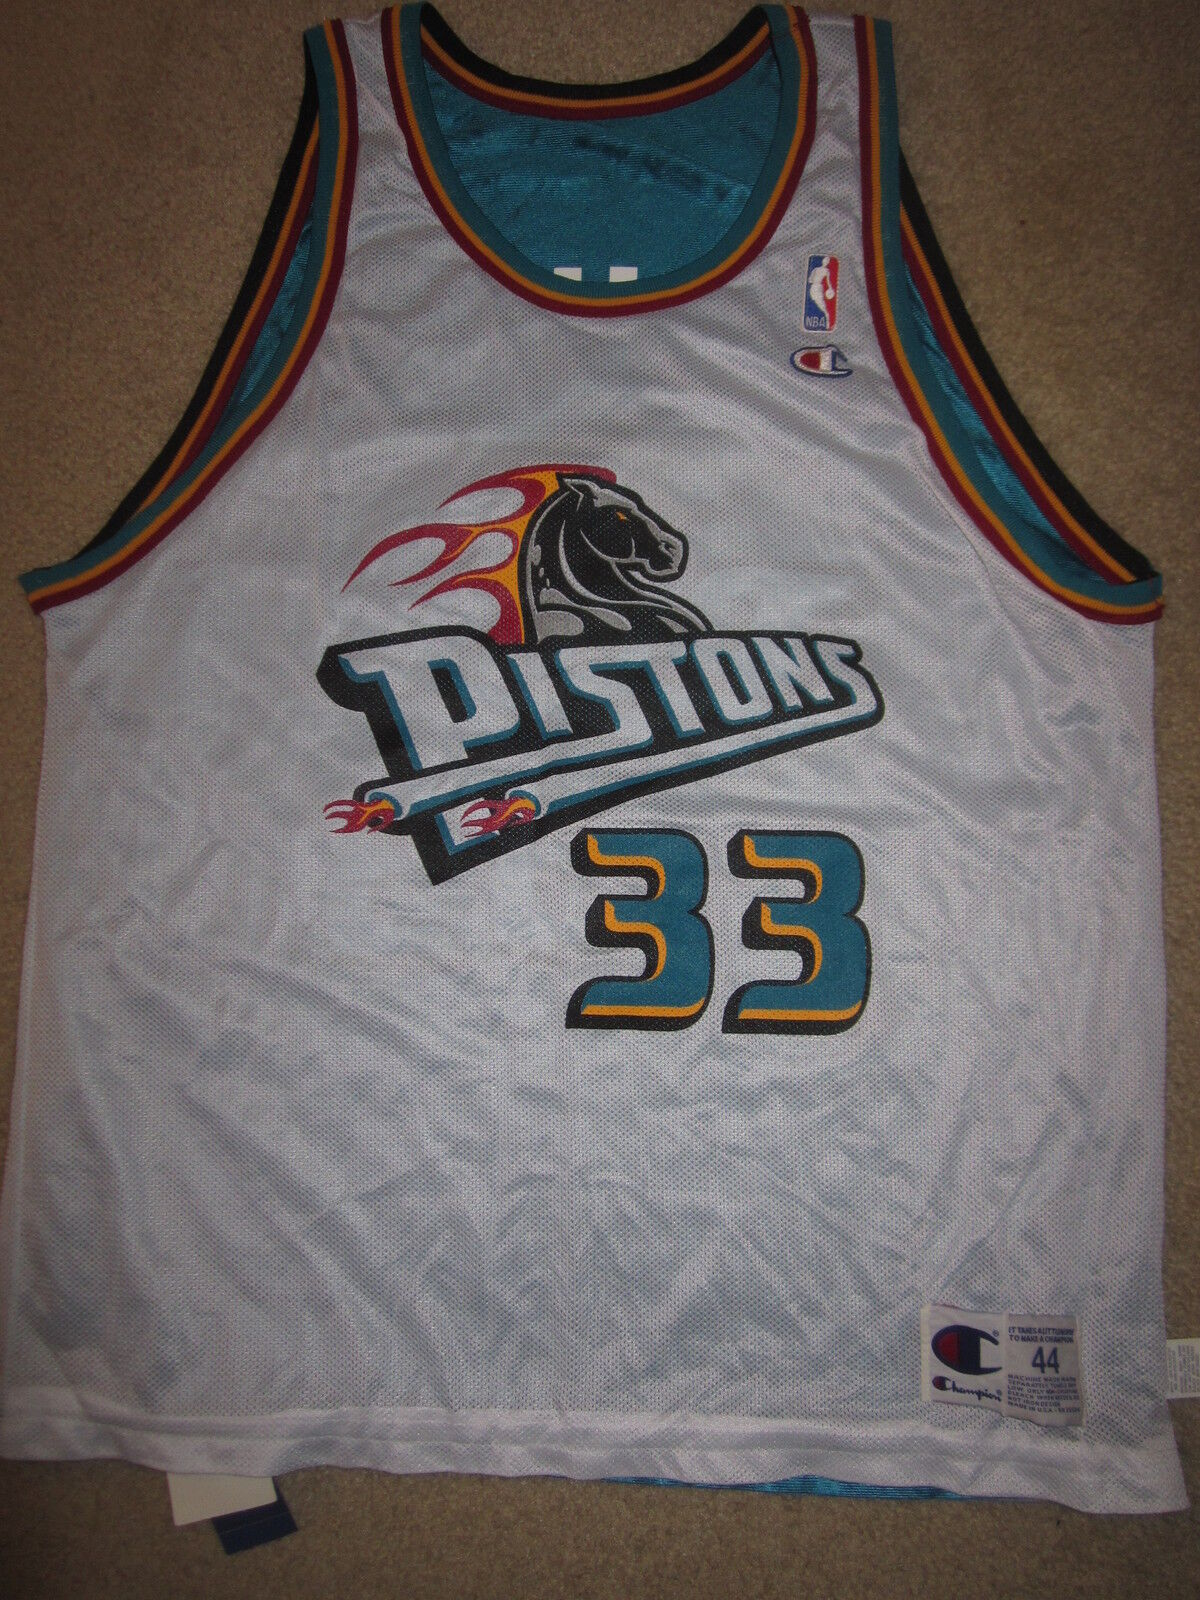 Grant Hill    33 Detroit Pistons NBA Champion Reverse Jersey 44 Lg Neu 879bc7